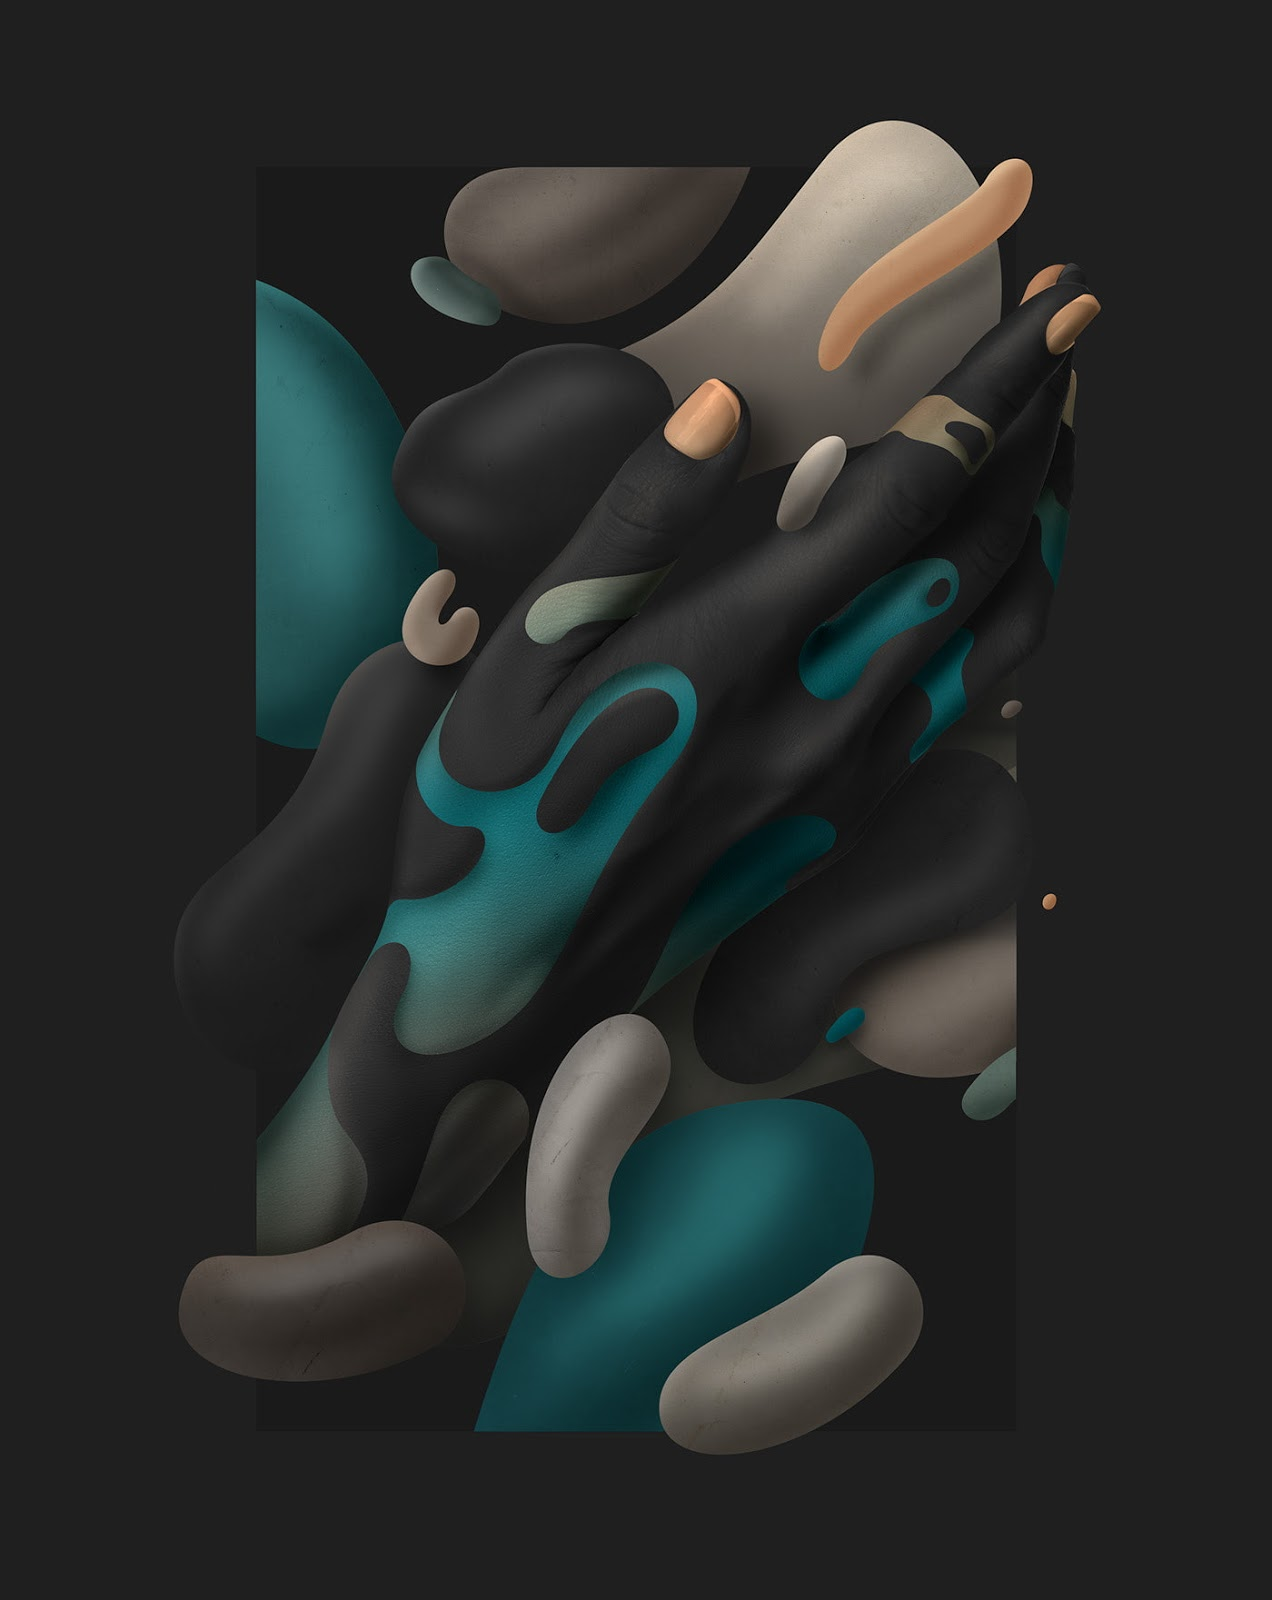 Fluidez-humana-hermosas-ilustraciones-digitales-de-Rik-Oostenbroek